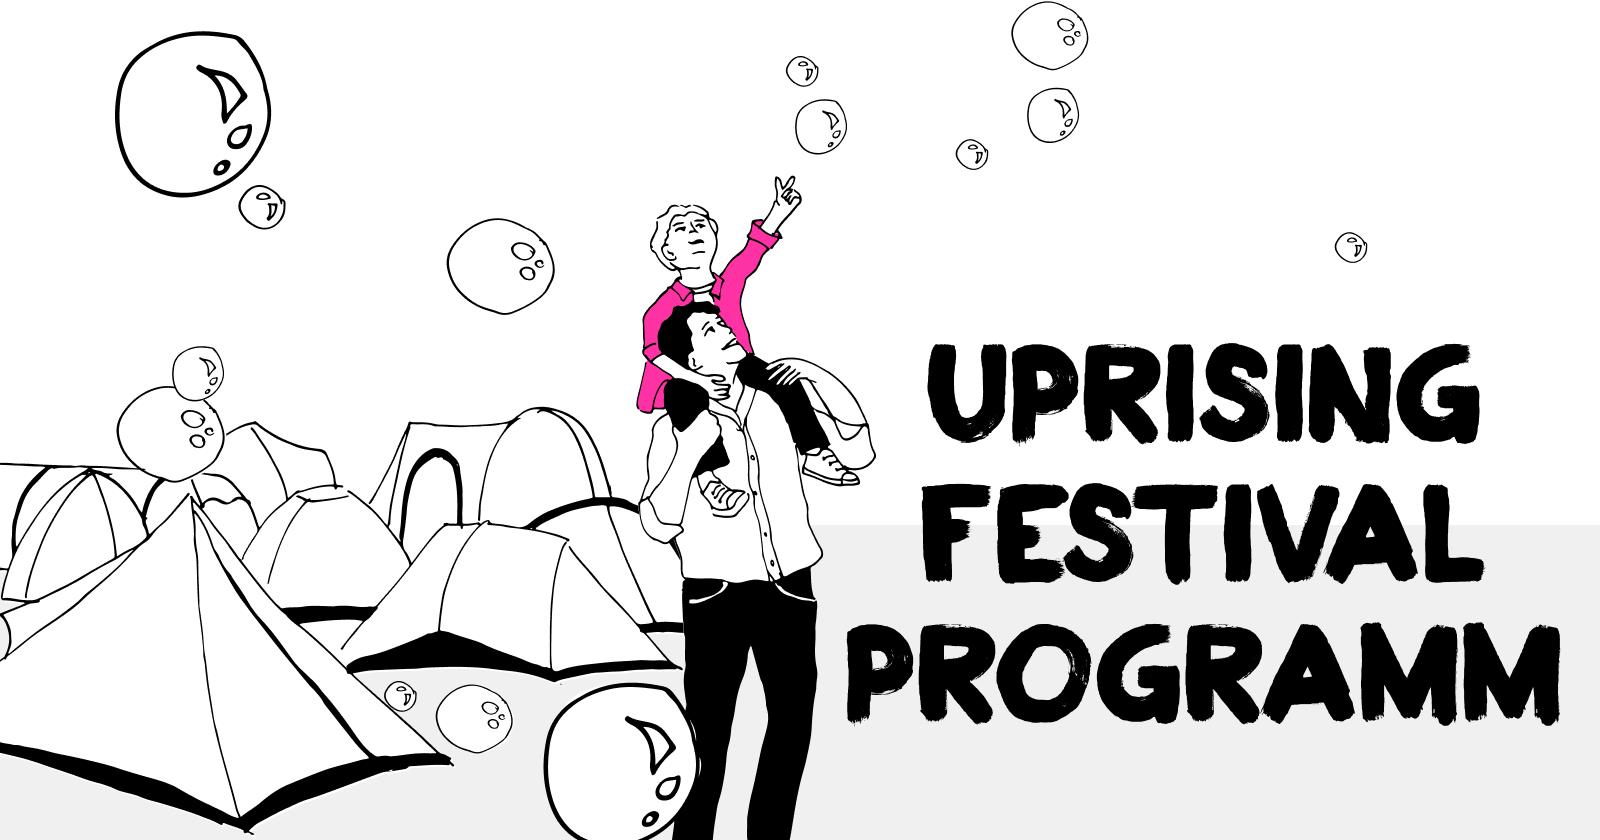 uprisingfestival-programm-header-mobile